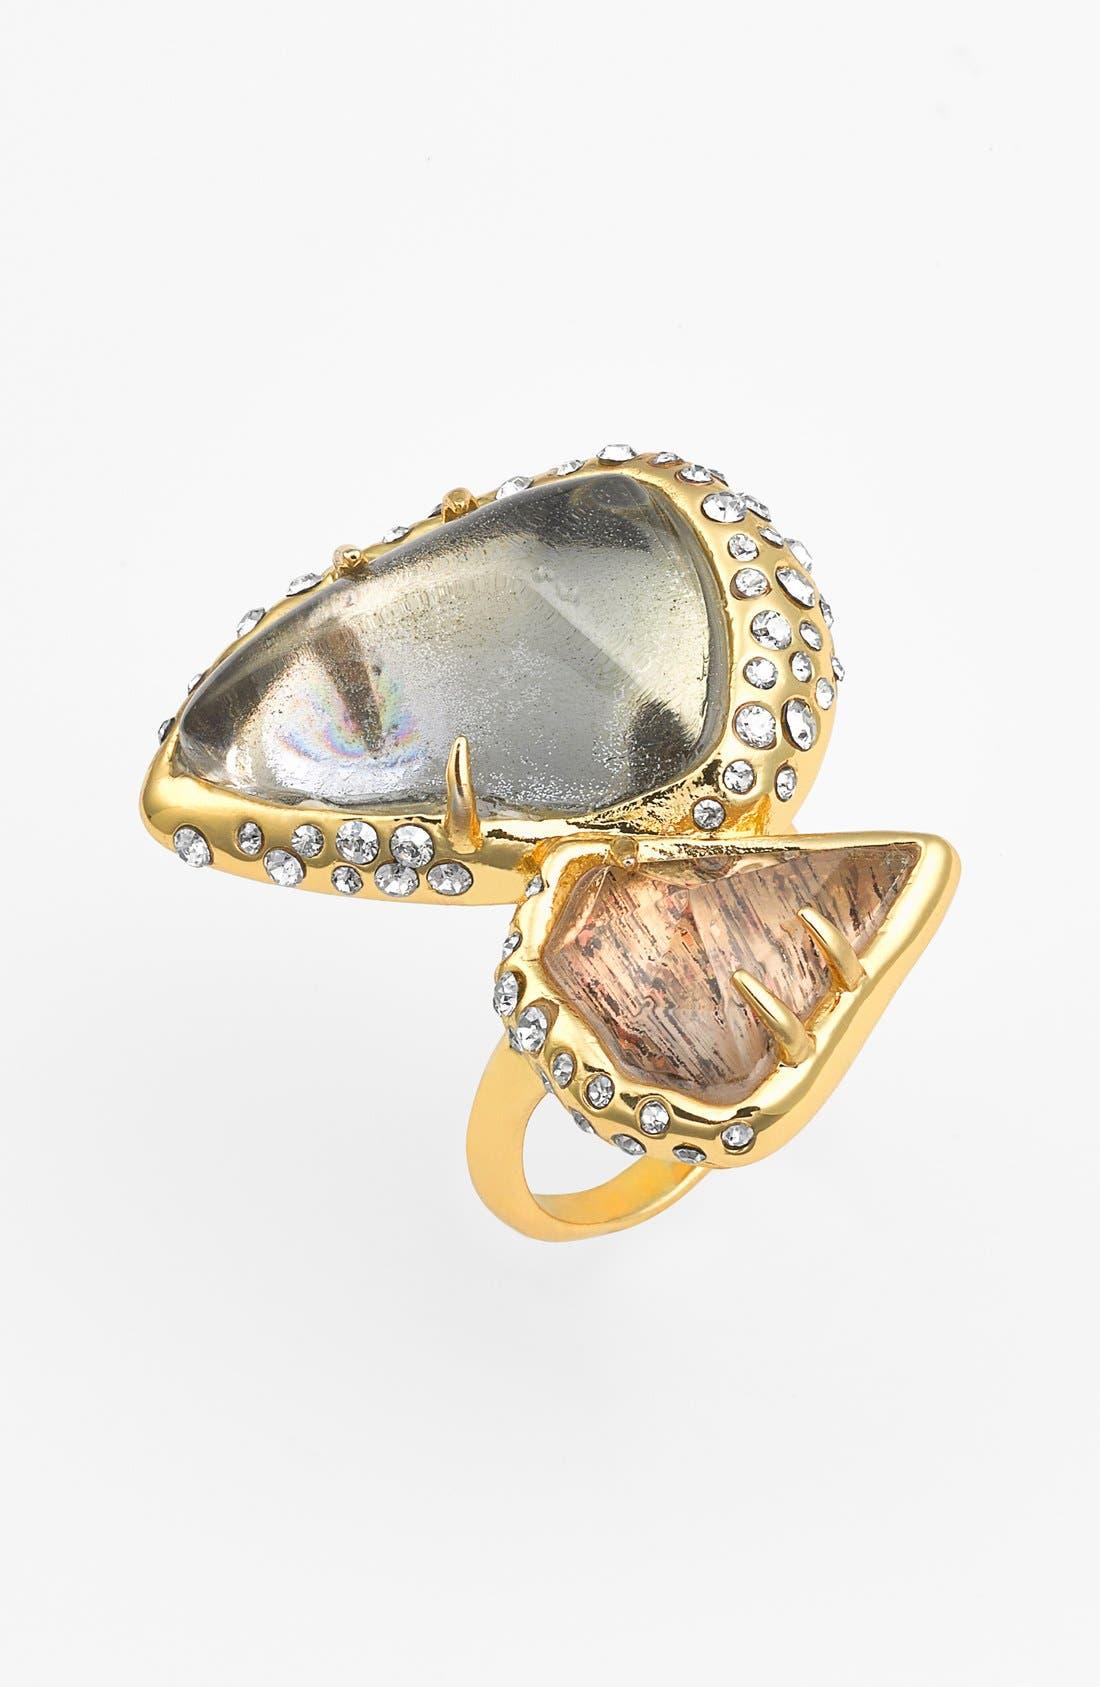 Main Image - Alexis Bittar 'Miss Havisham - Kinetic Gold' Cluster Ring